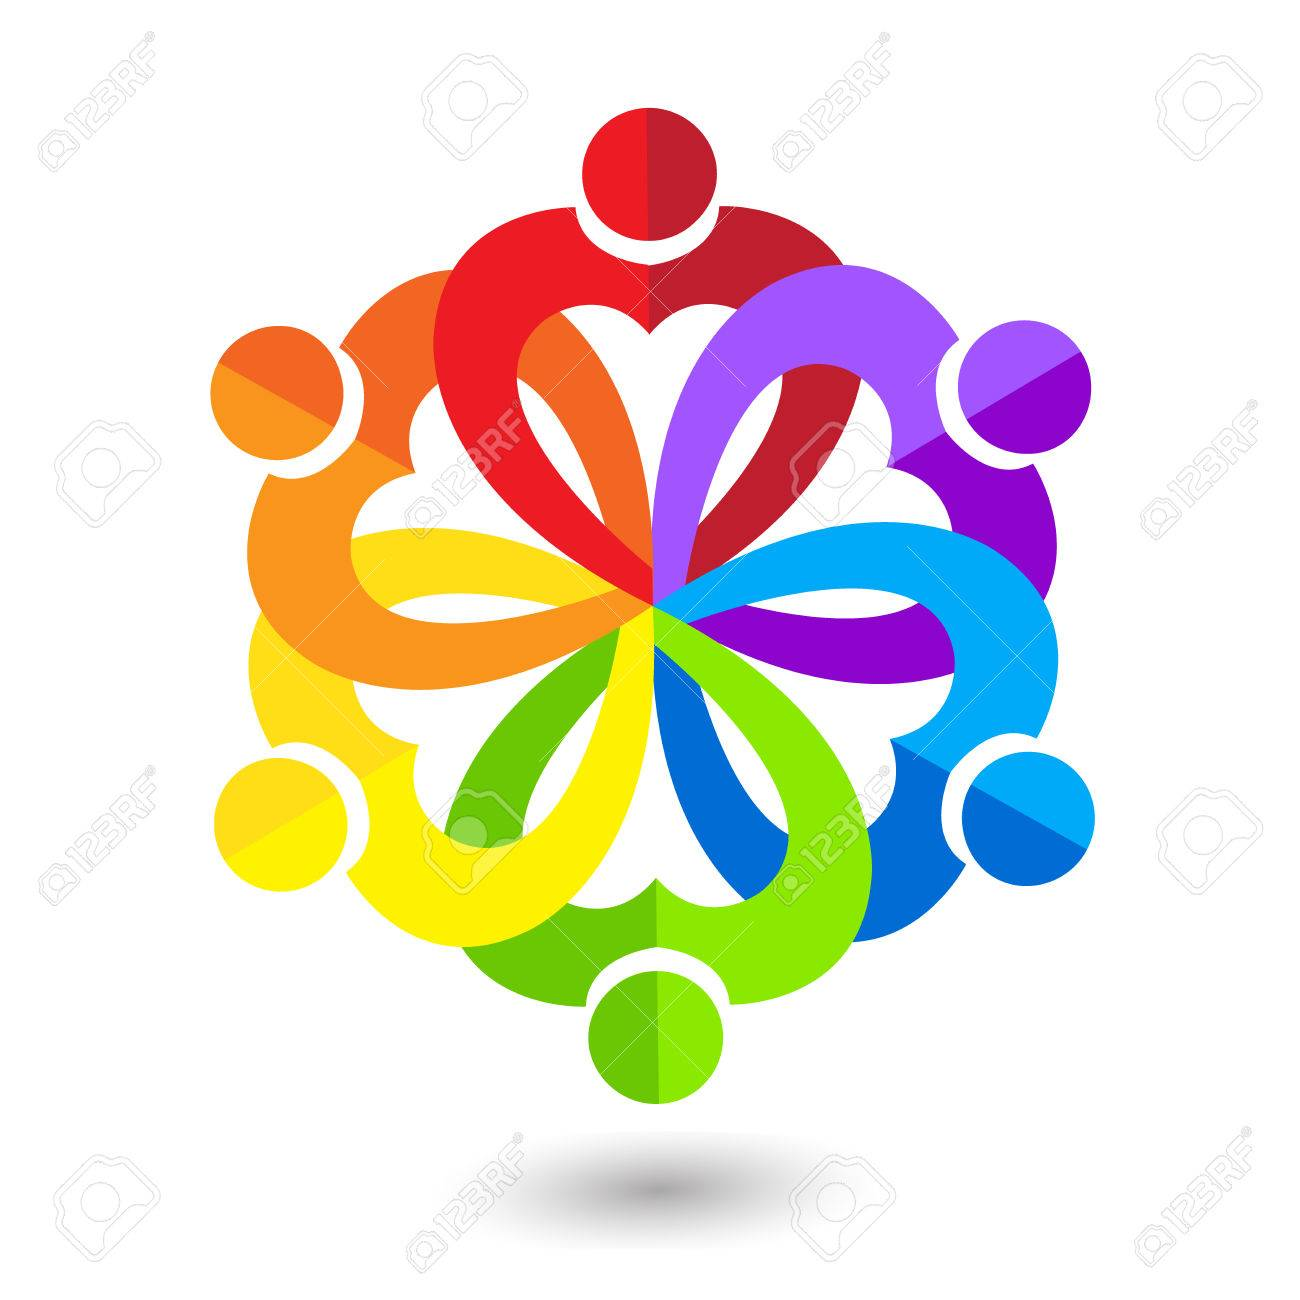 Heart love teamwork united people business card icon logo vector heart love teamwork united people business card icon logo vector image stock vector 82240324 colourmoves